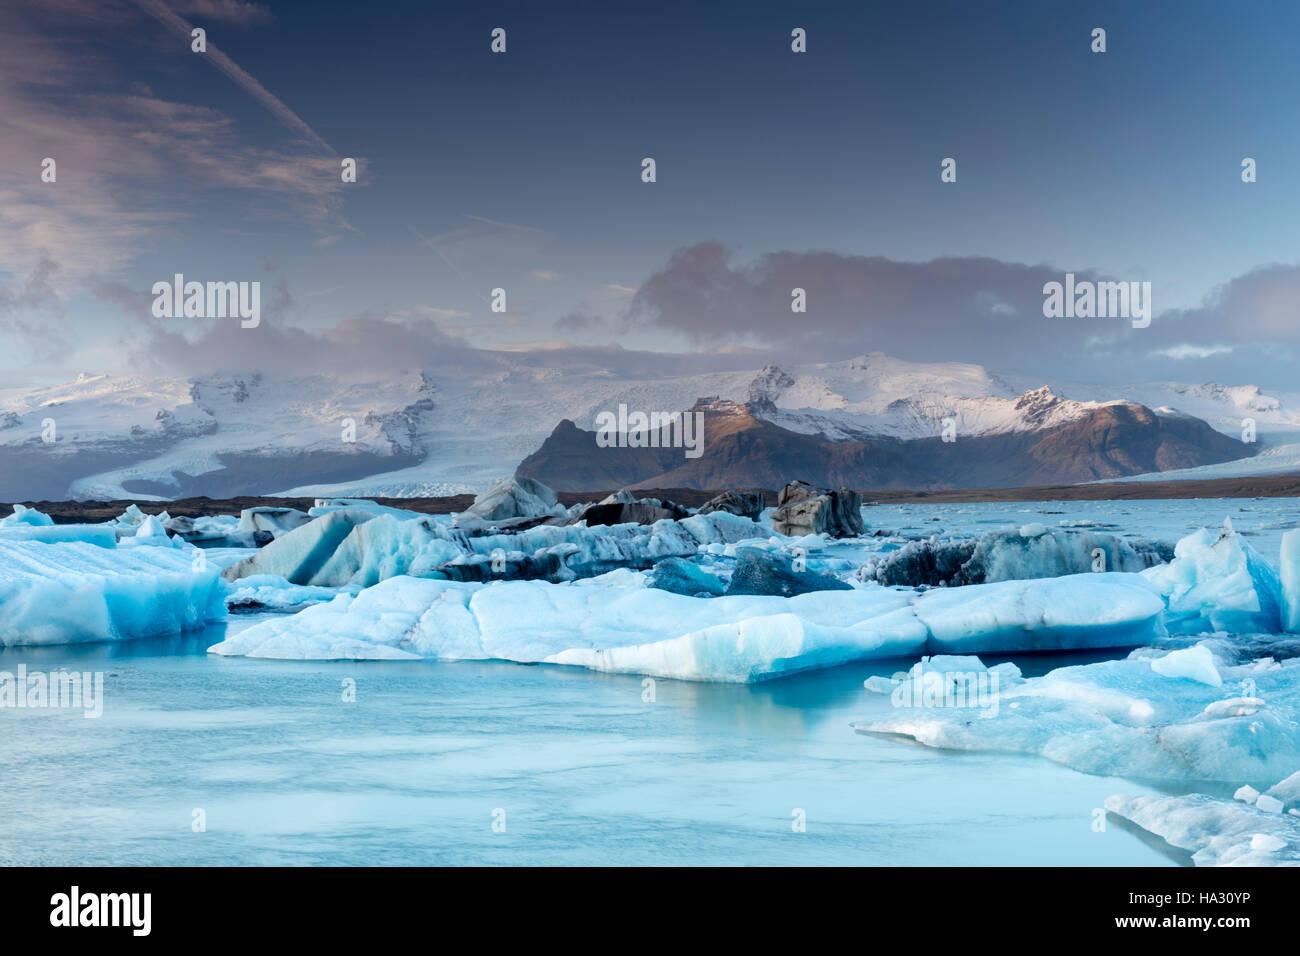 Icebergs in Jokulsarlon, a glacial lake in southeast Iceland, on the edge of Vatnajokull National Park - Stock Image